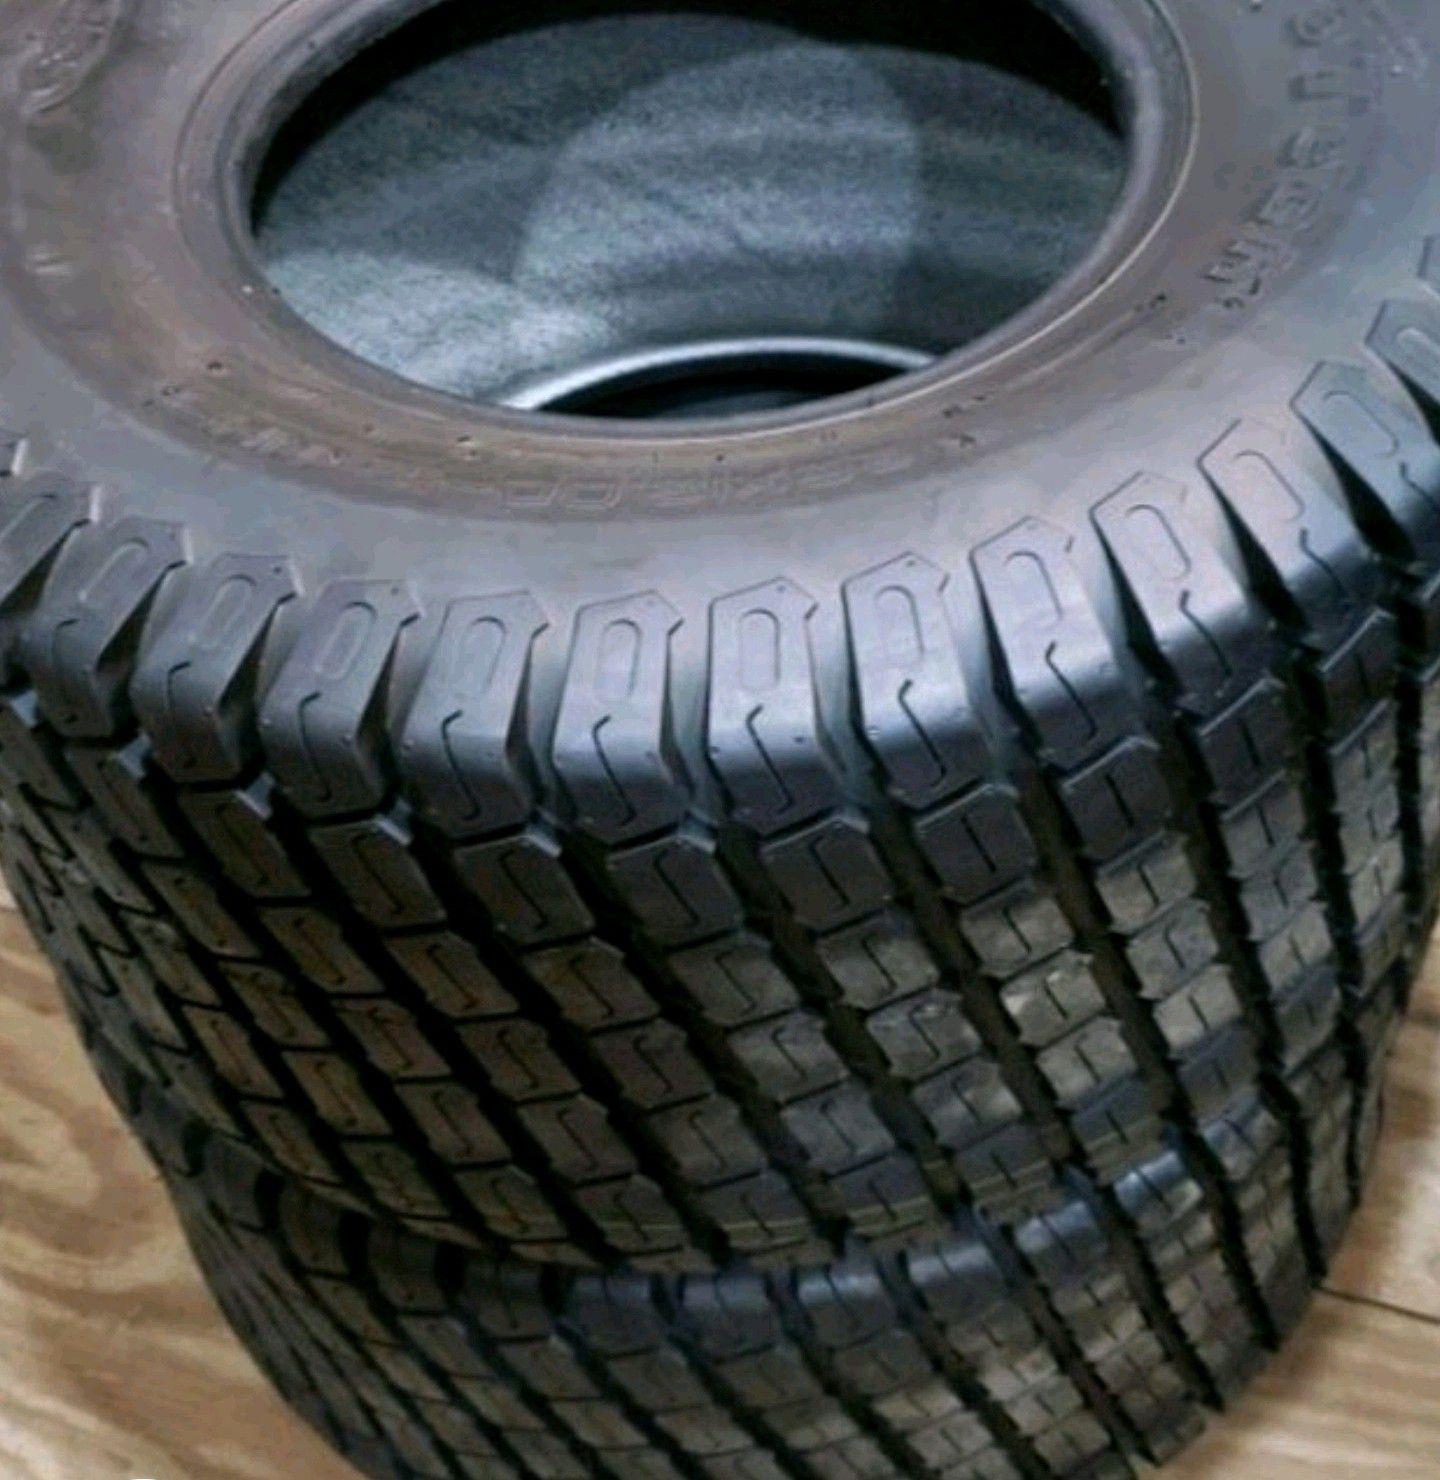 Lawn and Garden tires rear set.